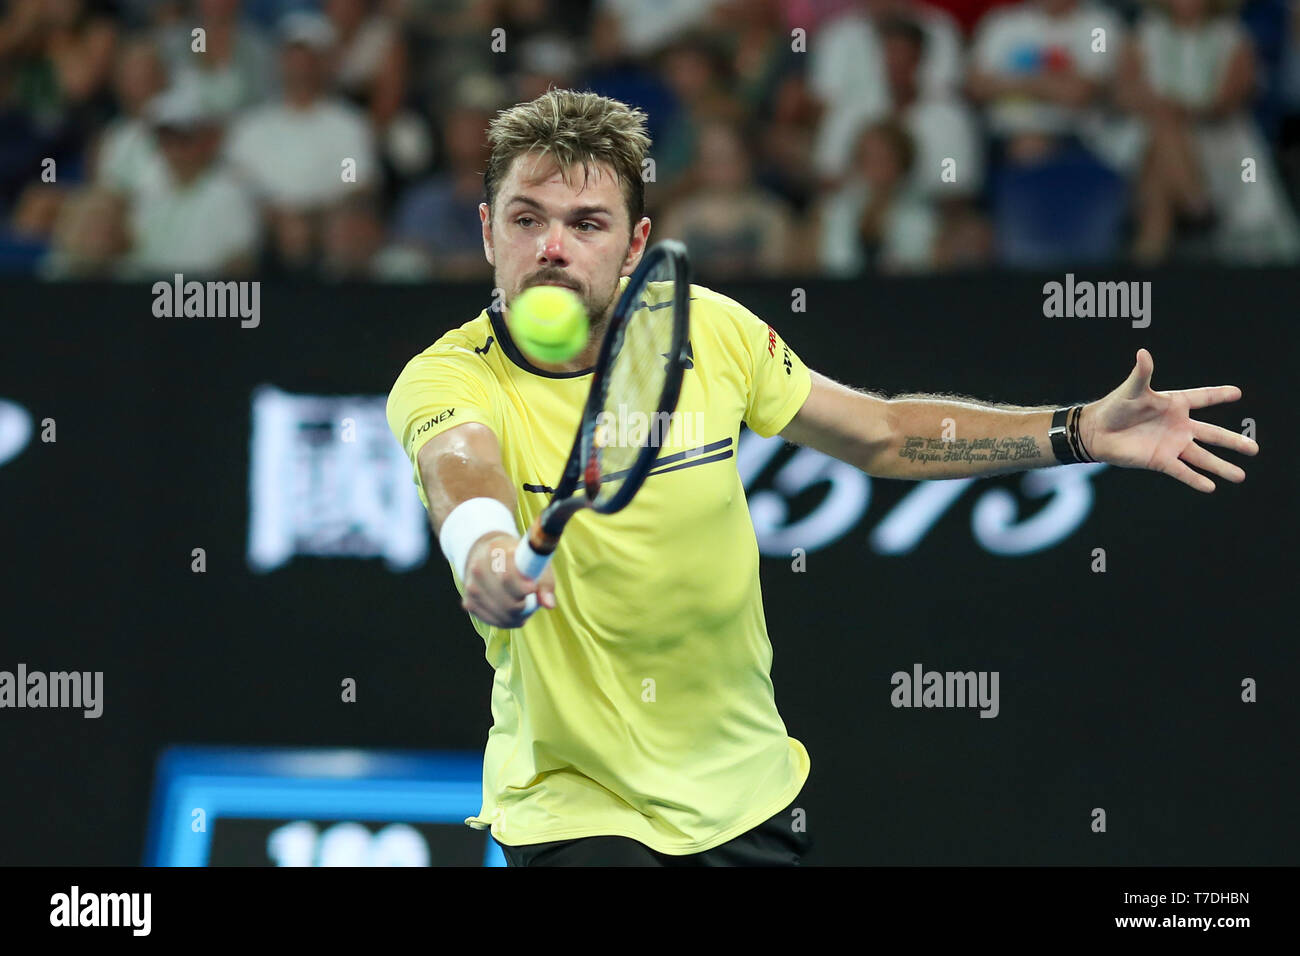 Swiss tennis player Stan Wawrinka playing backhand shot in Australian Open 2019 tennis tournament, Melbourne Park, Melbourne, Victoria, Australia - Stock Image